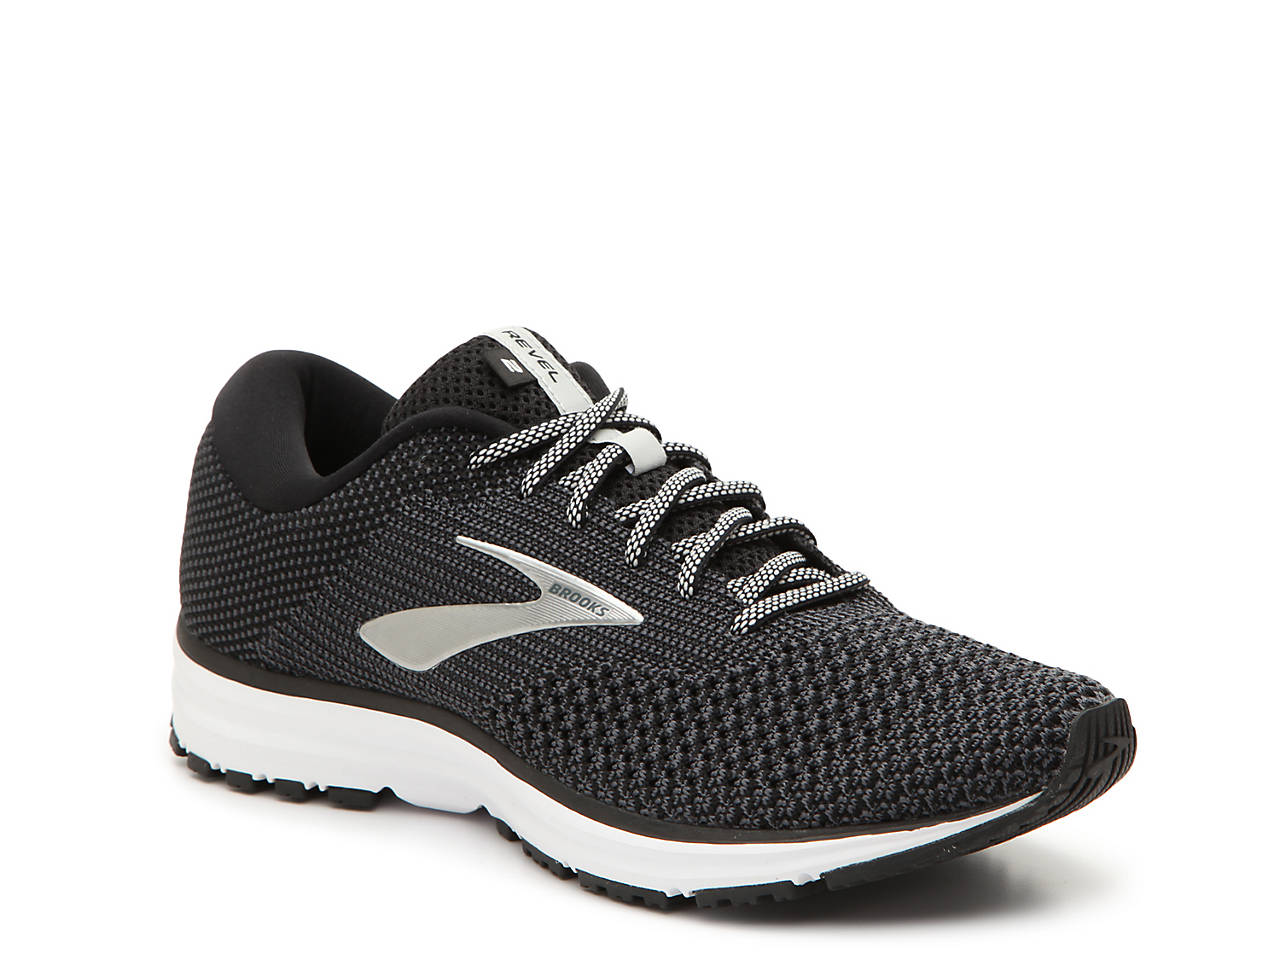 daff800067f Brooks Revel 2 Performance Running Shoe - Women s Women s Shoes